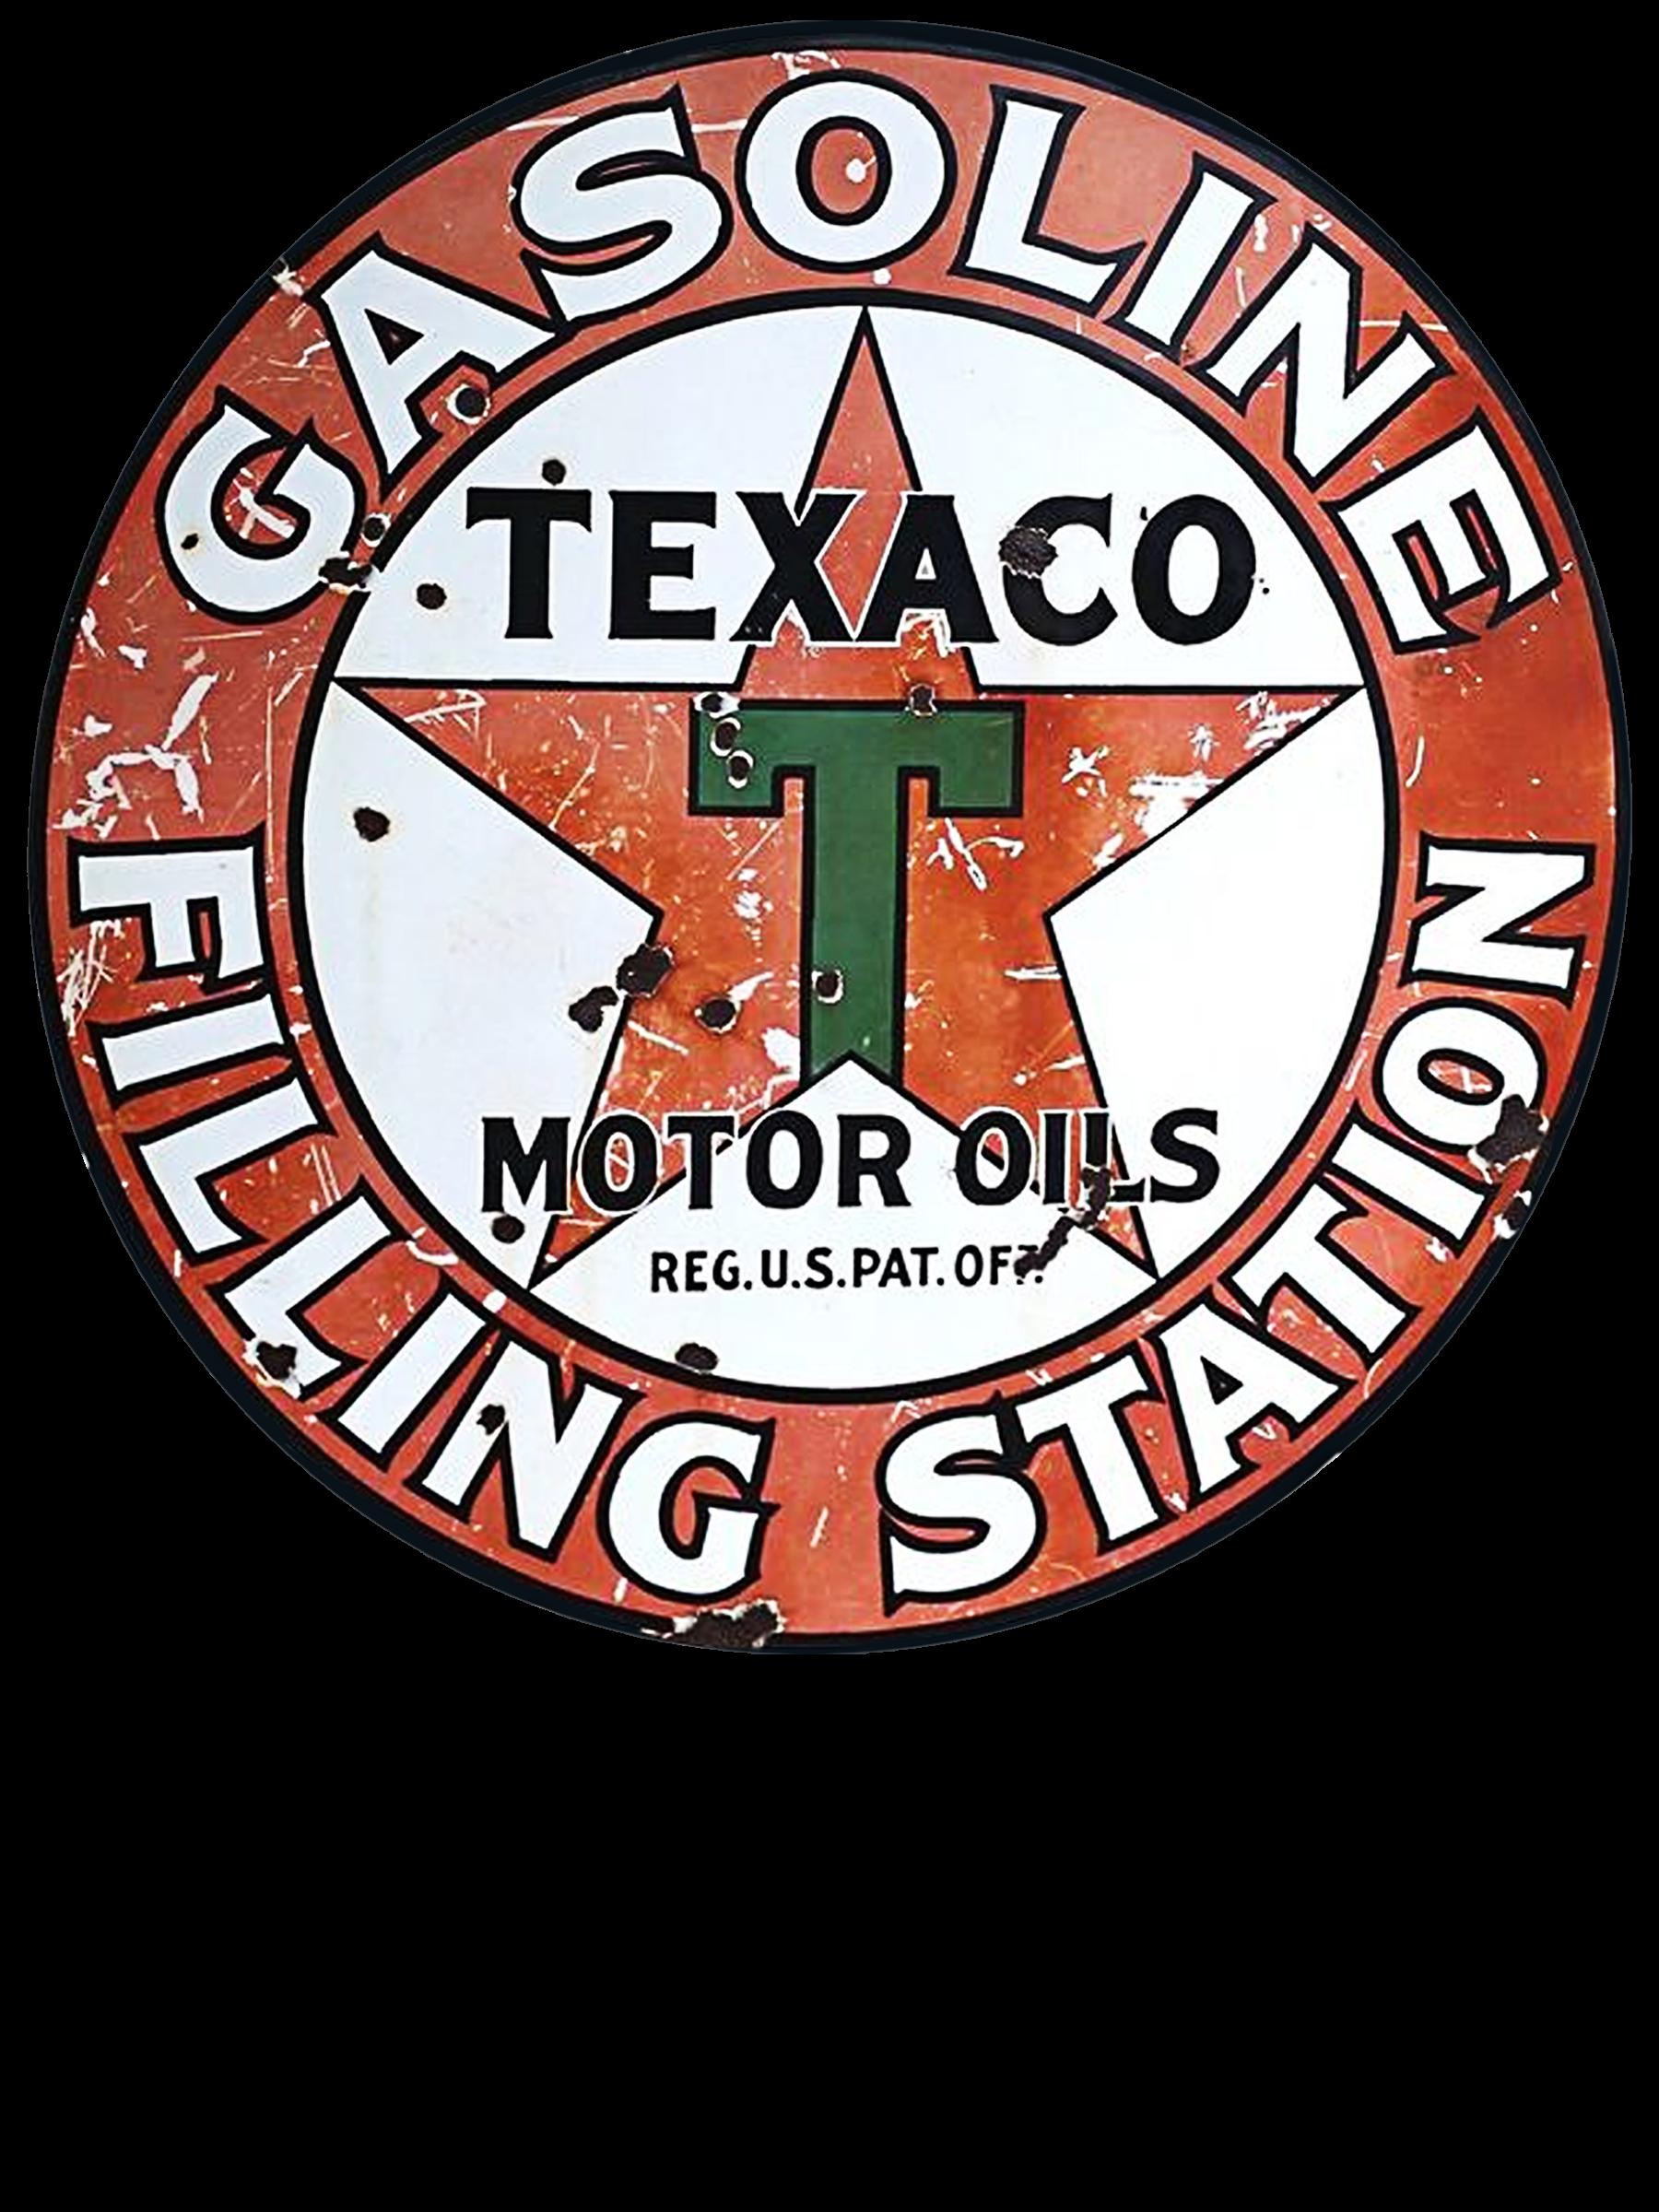 VINTAGE STYLE 2 INCH TEXACO GASOLINE MOTOR OIL DECAL STICKER